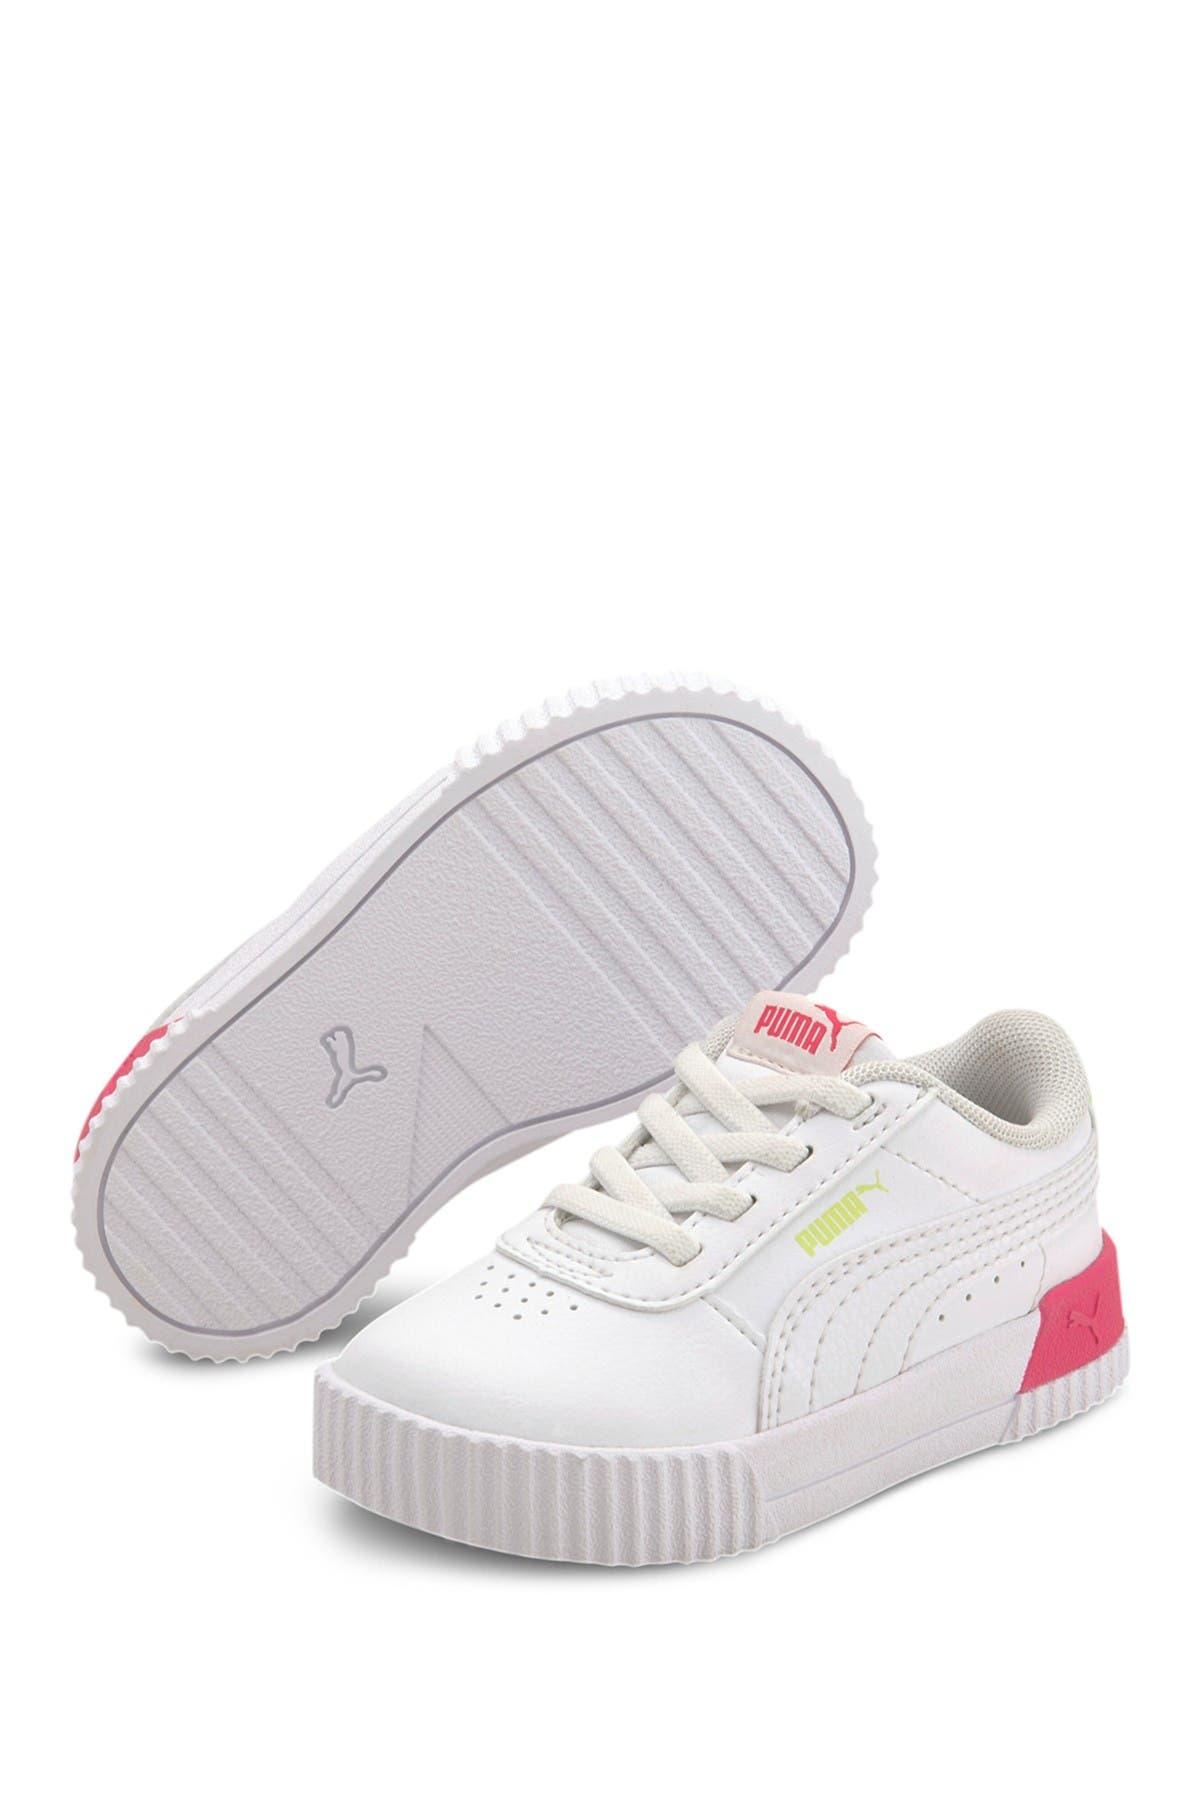 Image of PUMA Carina Vivid Sneaker